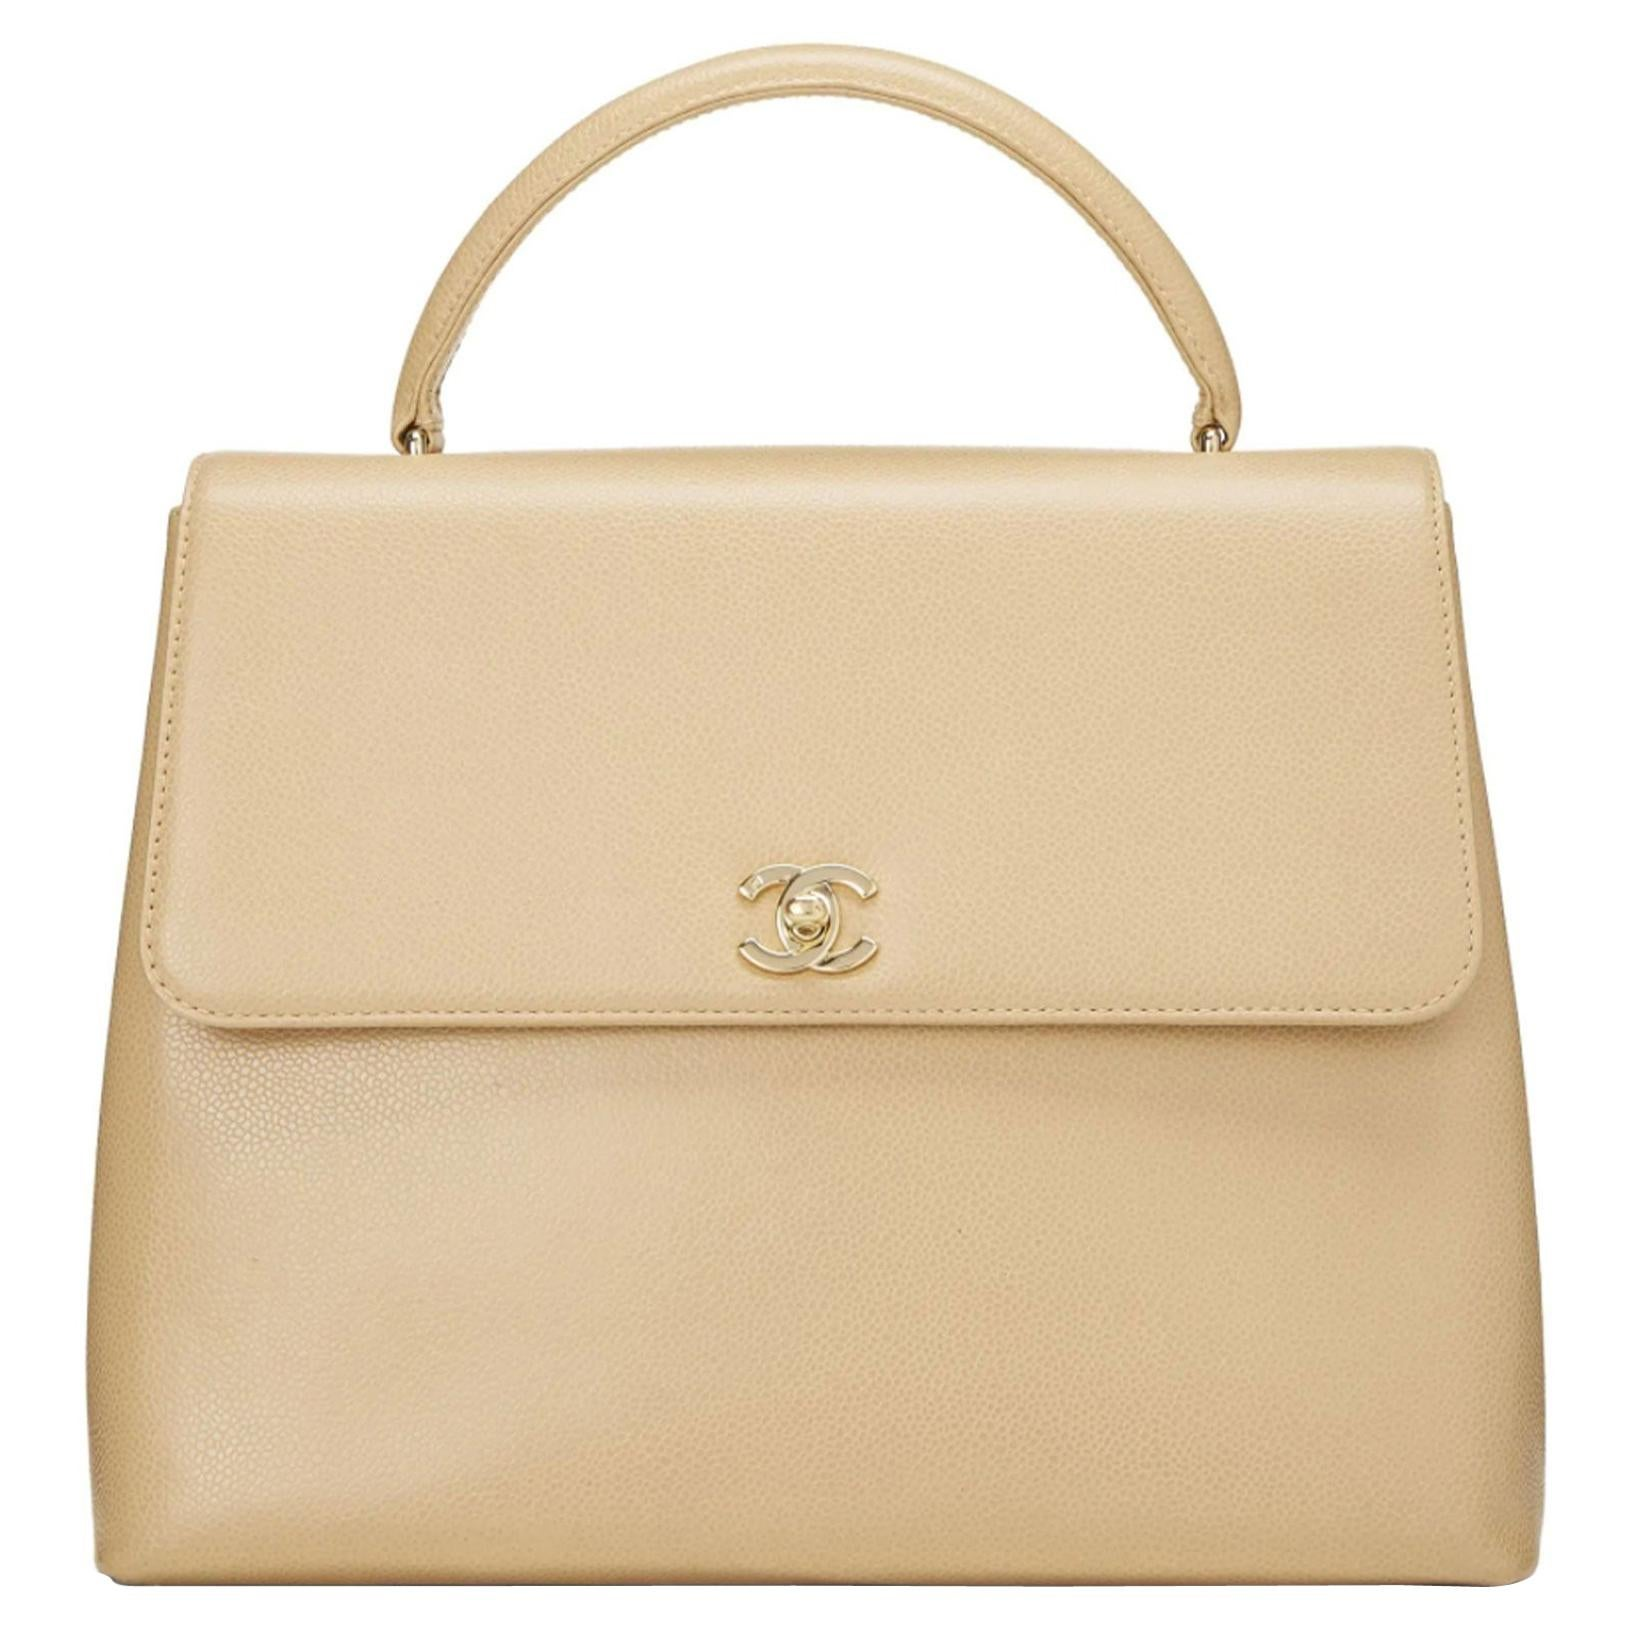 Chanel Vintage Rare Beige Caviar Top Handle Classic Kelly Flap Bag